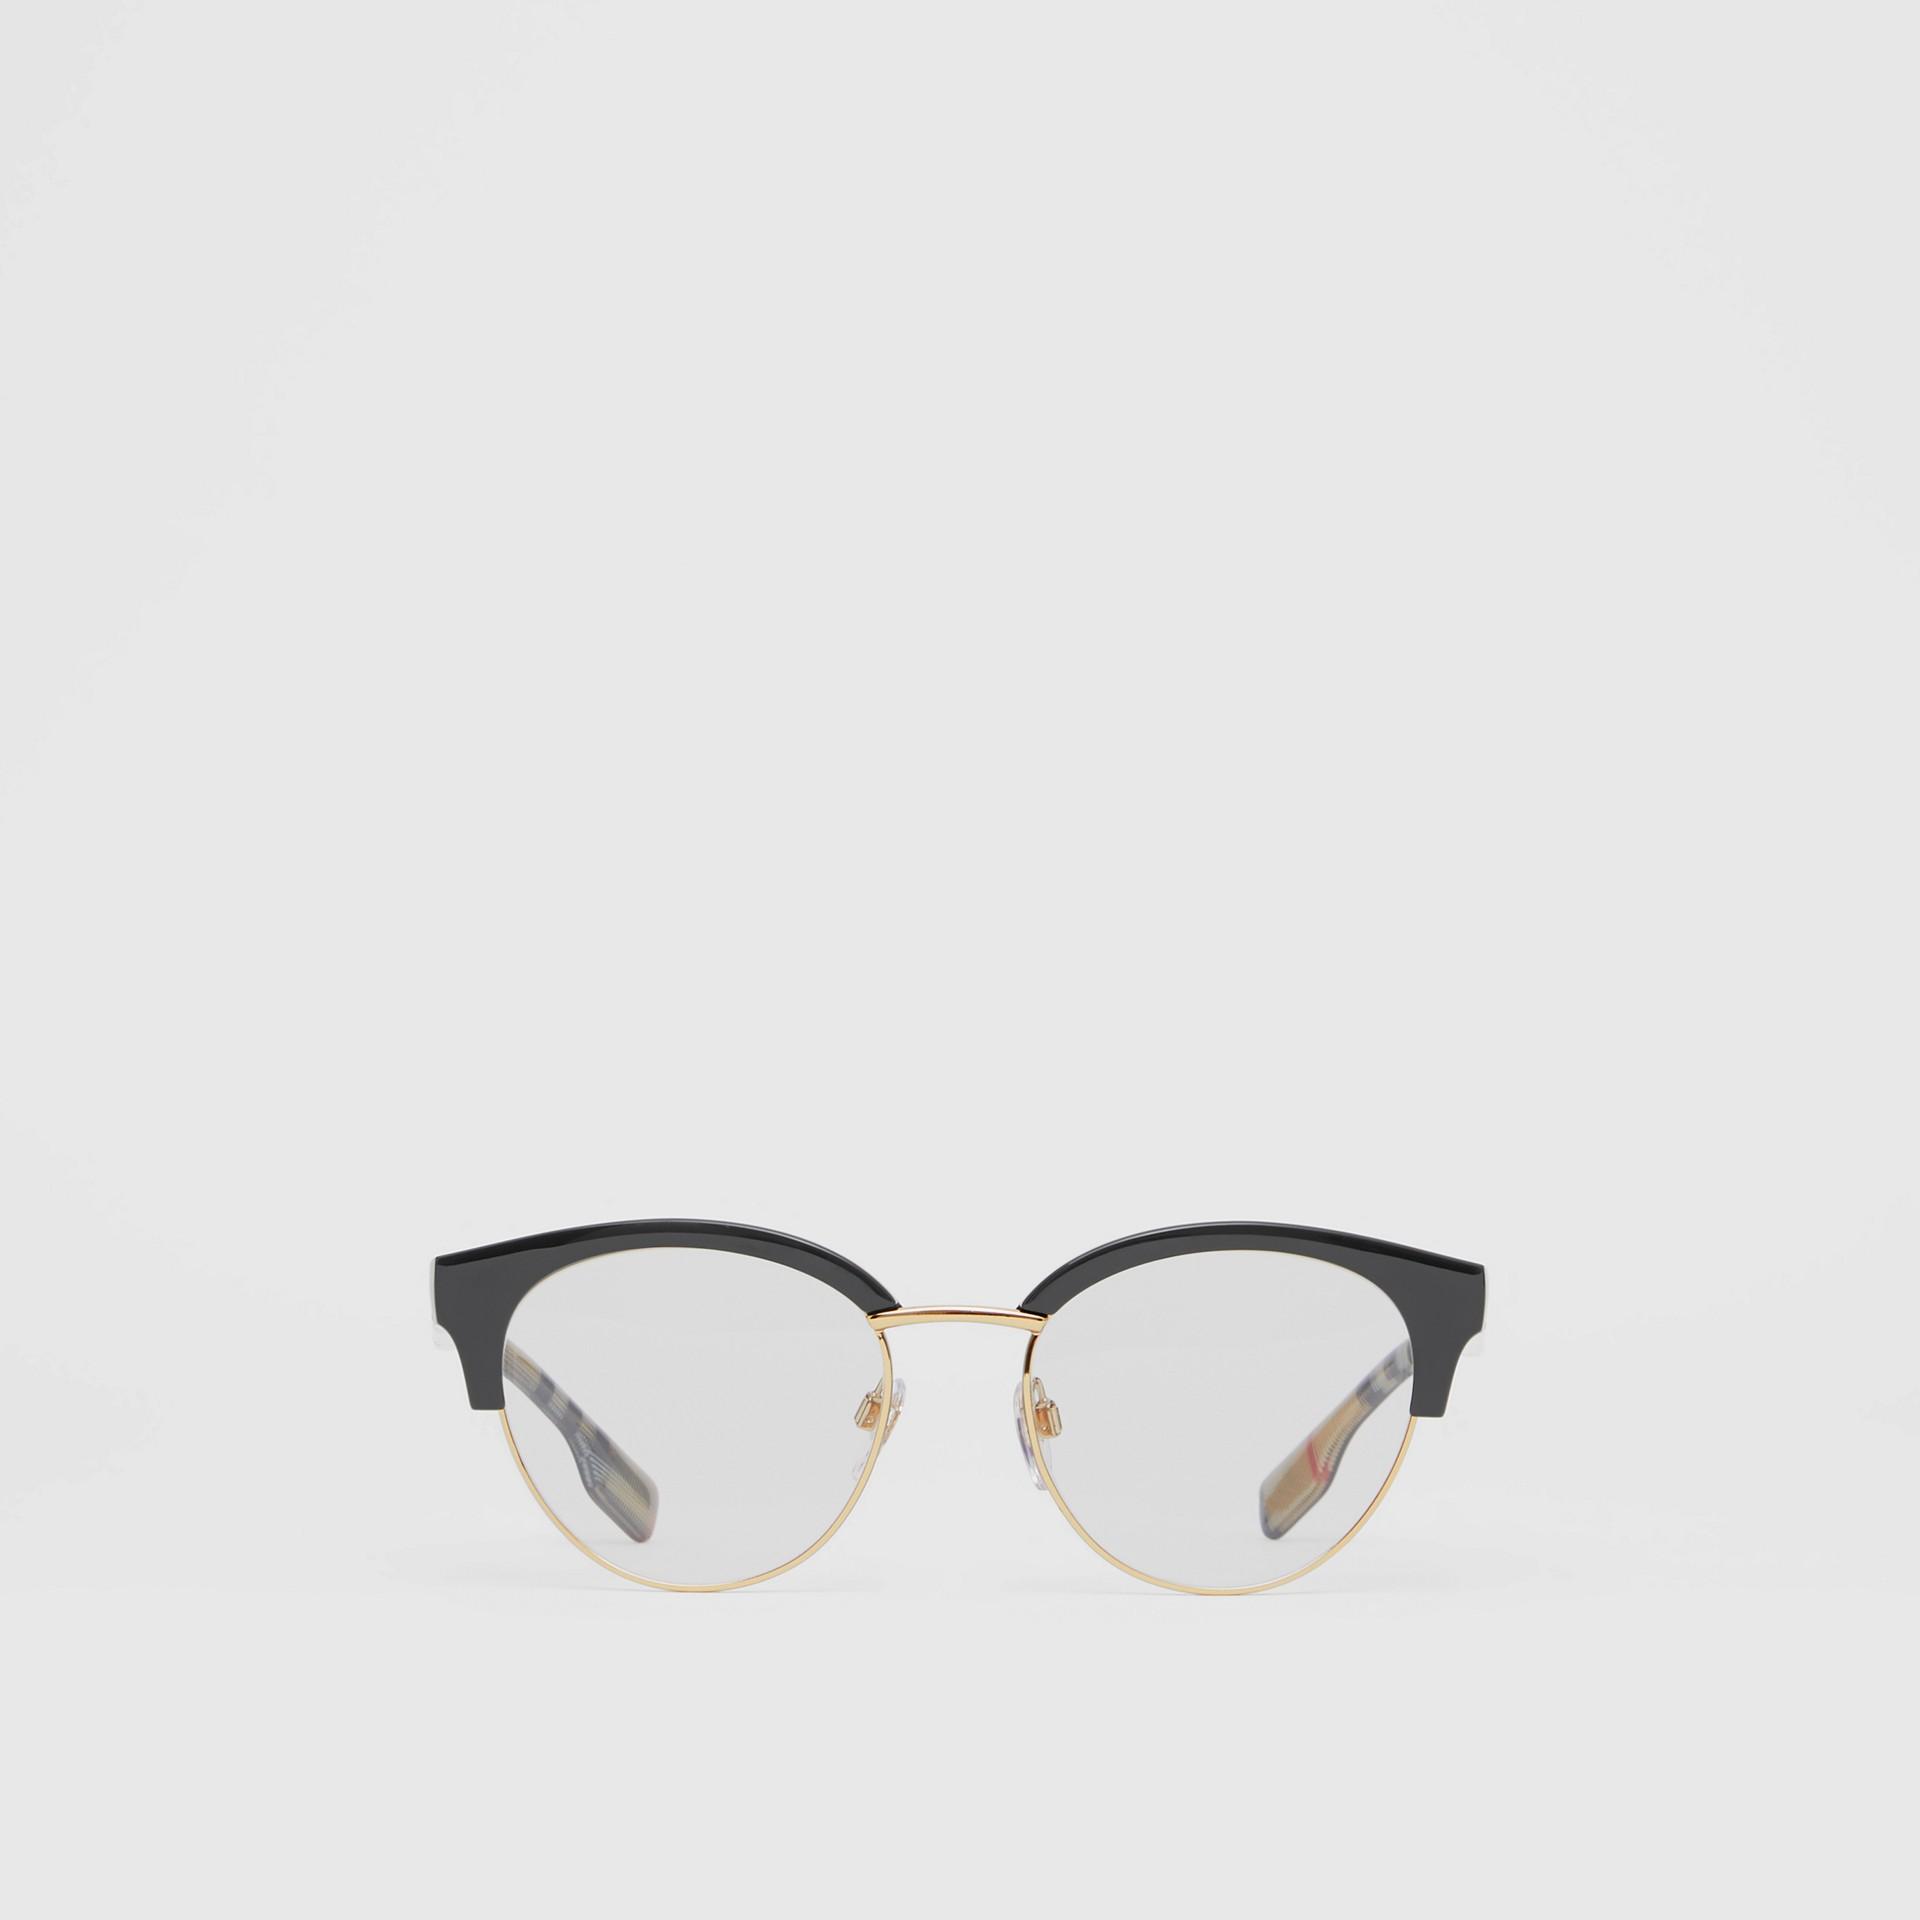 Cat-eye Optical Frames in Black/beige - Women | Burberry - gallery image 0